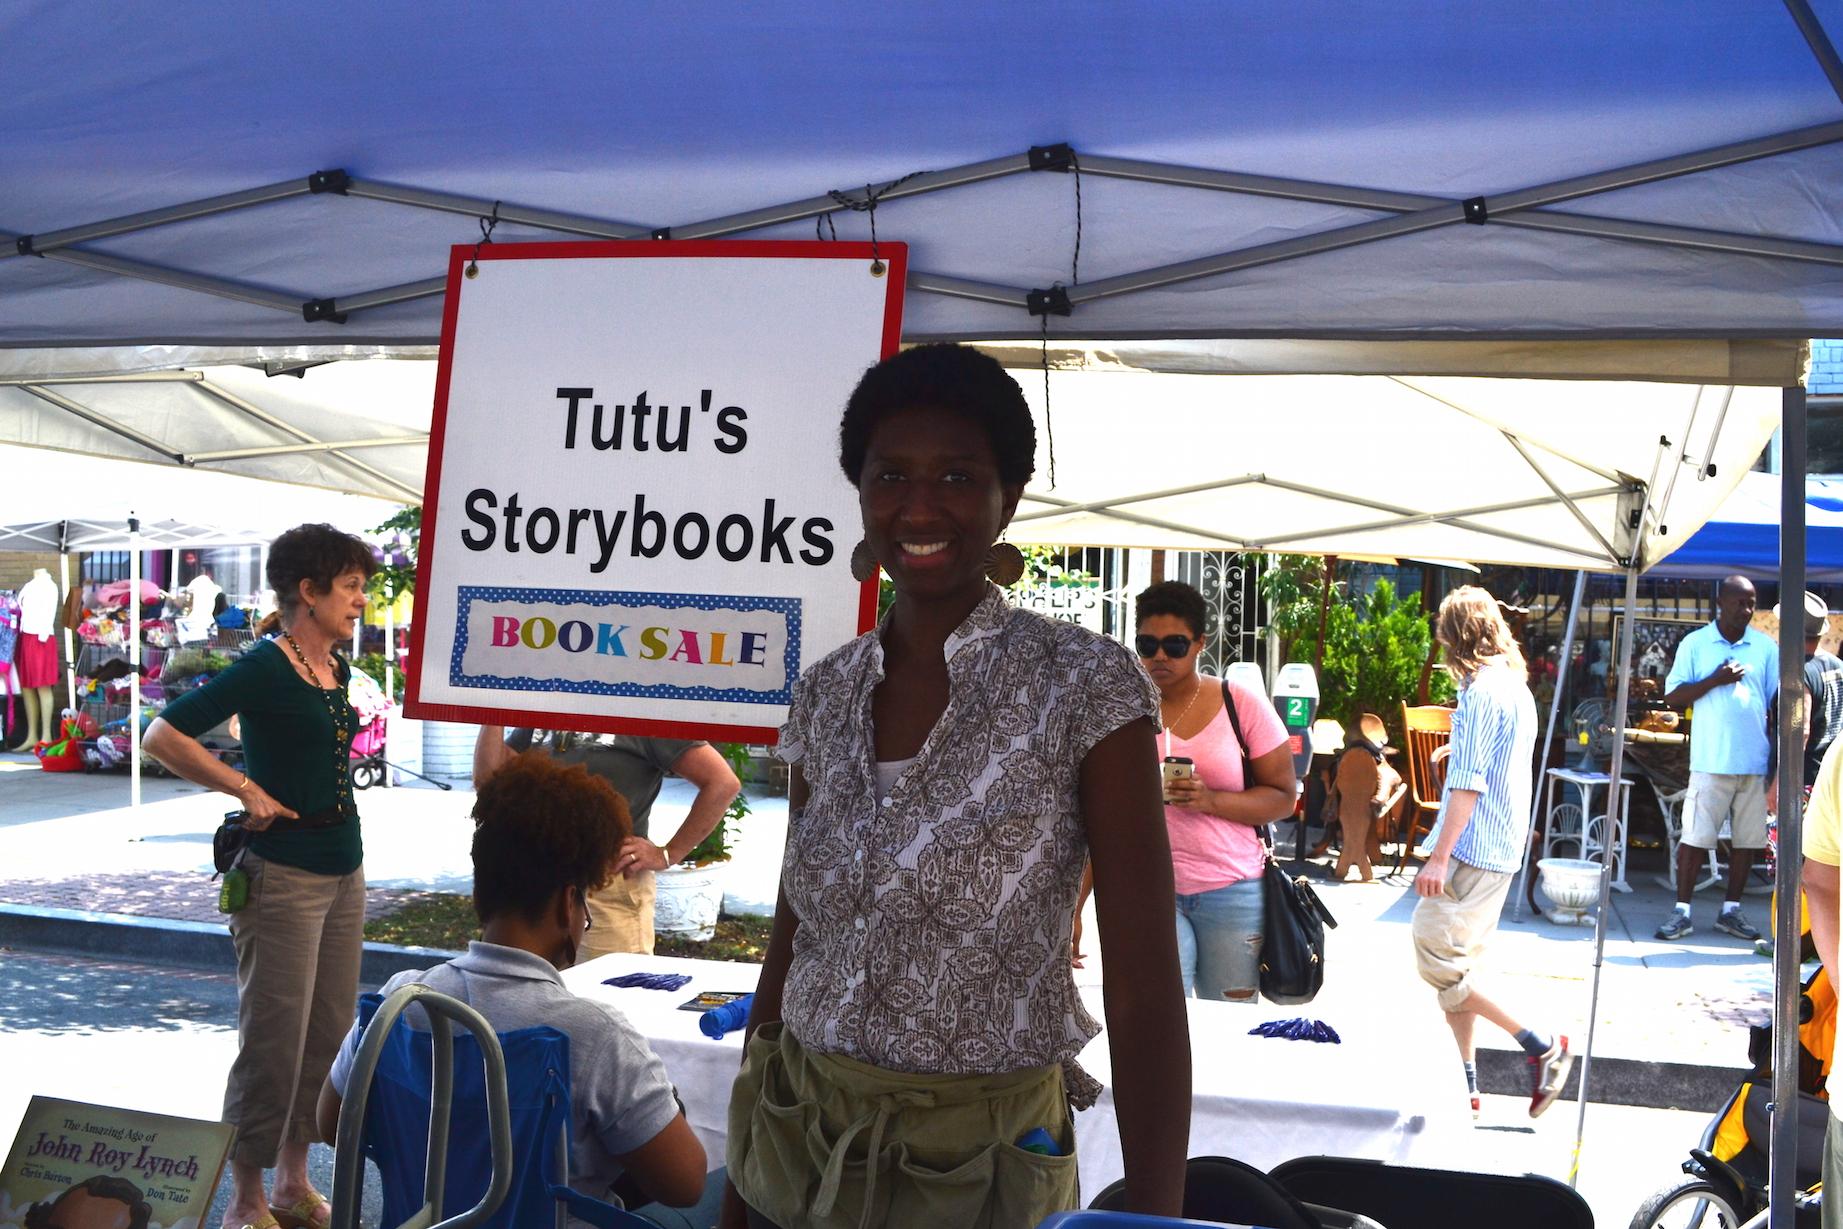 Miamunah Marah from Tutu's Storybooks   shop.tutusstorybooks.com